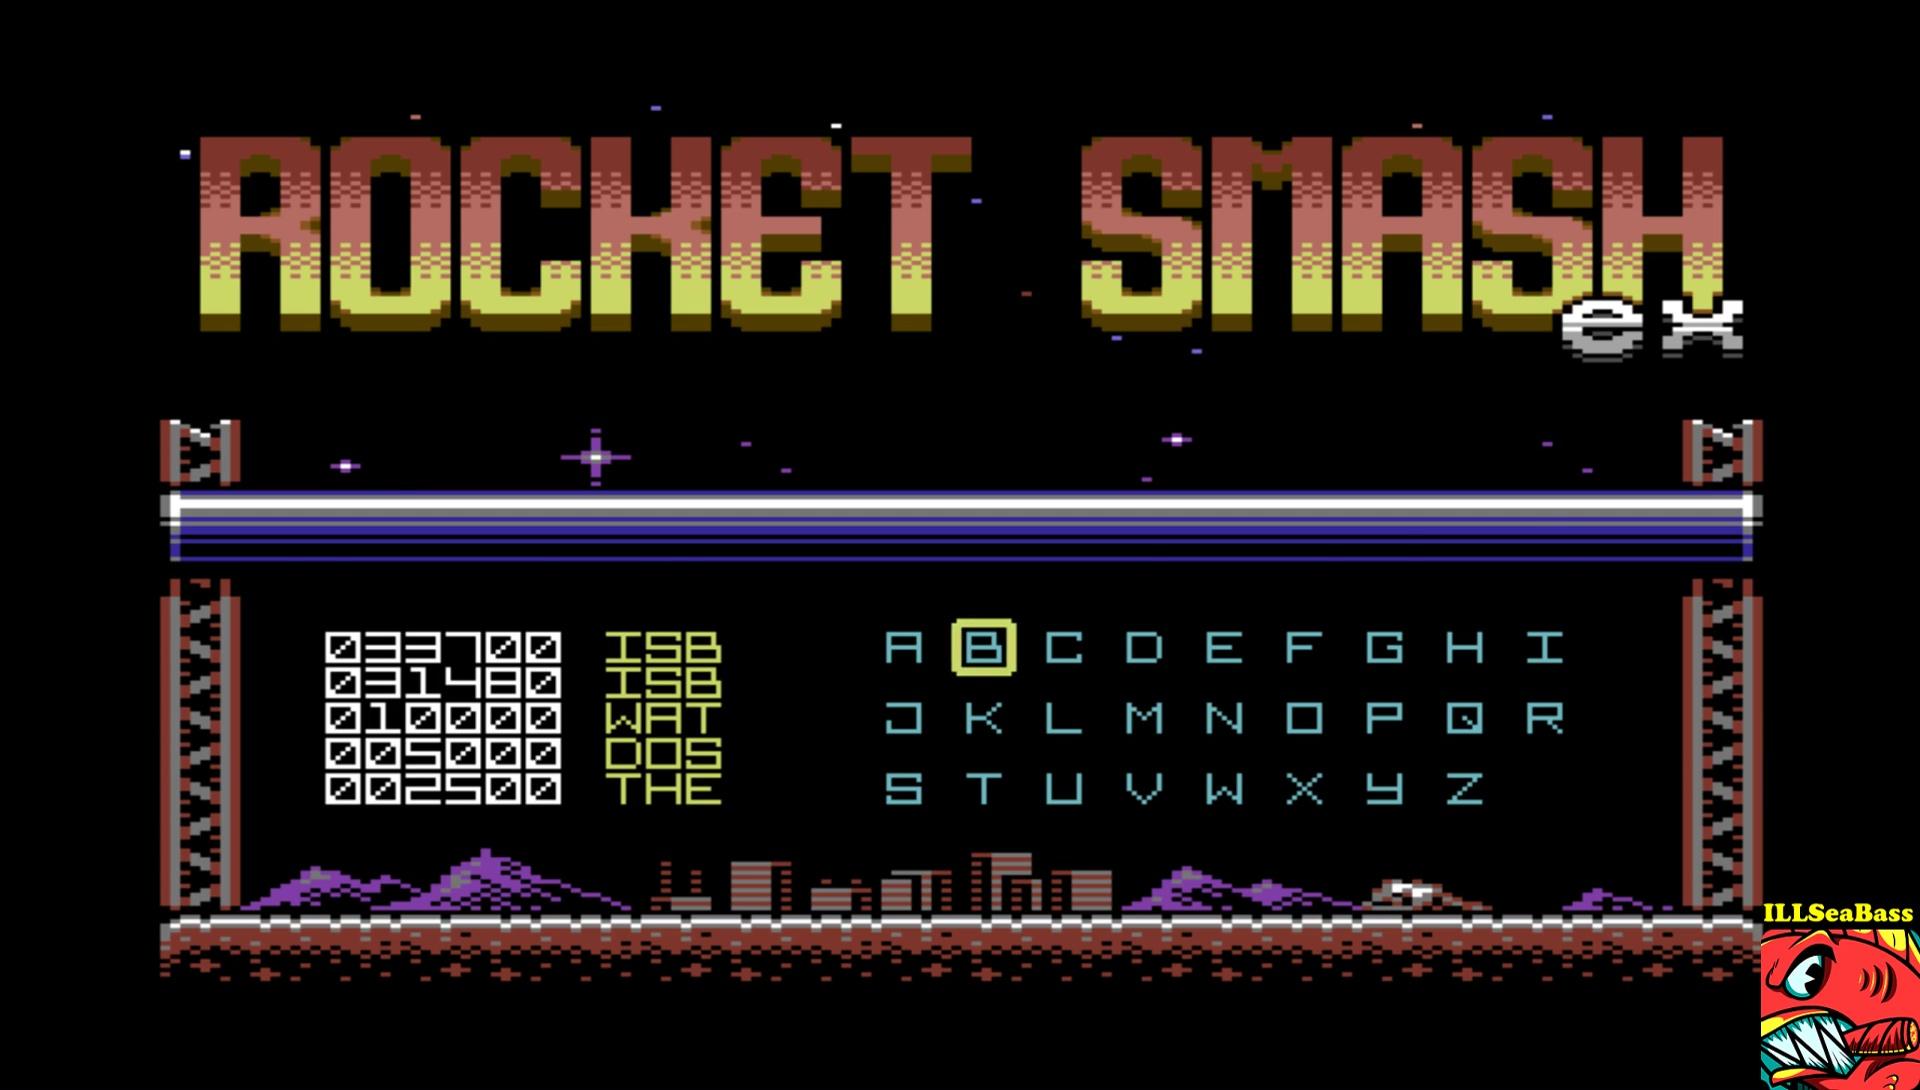 ILLSeaBass: Rocket Smash EX [Story: Hard] (Commodore 64 Emulated) 33,700 points on 2017-04-16 22:05:57